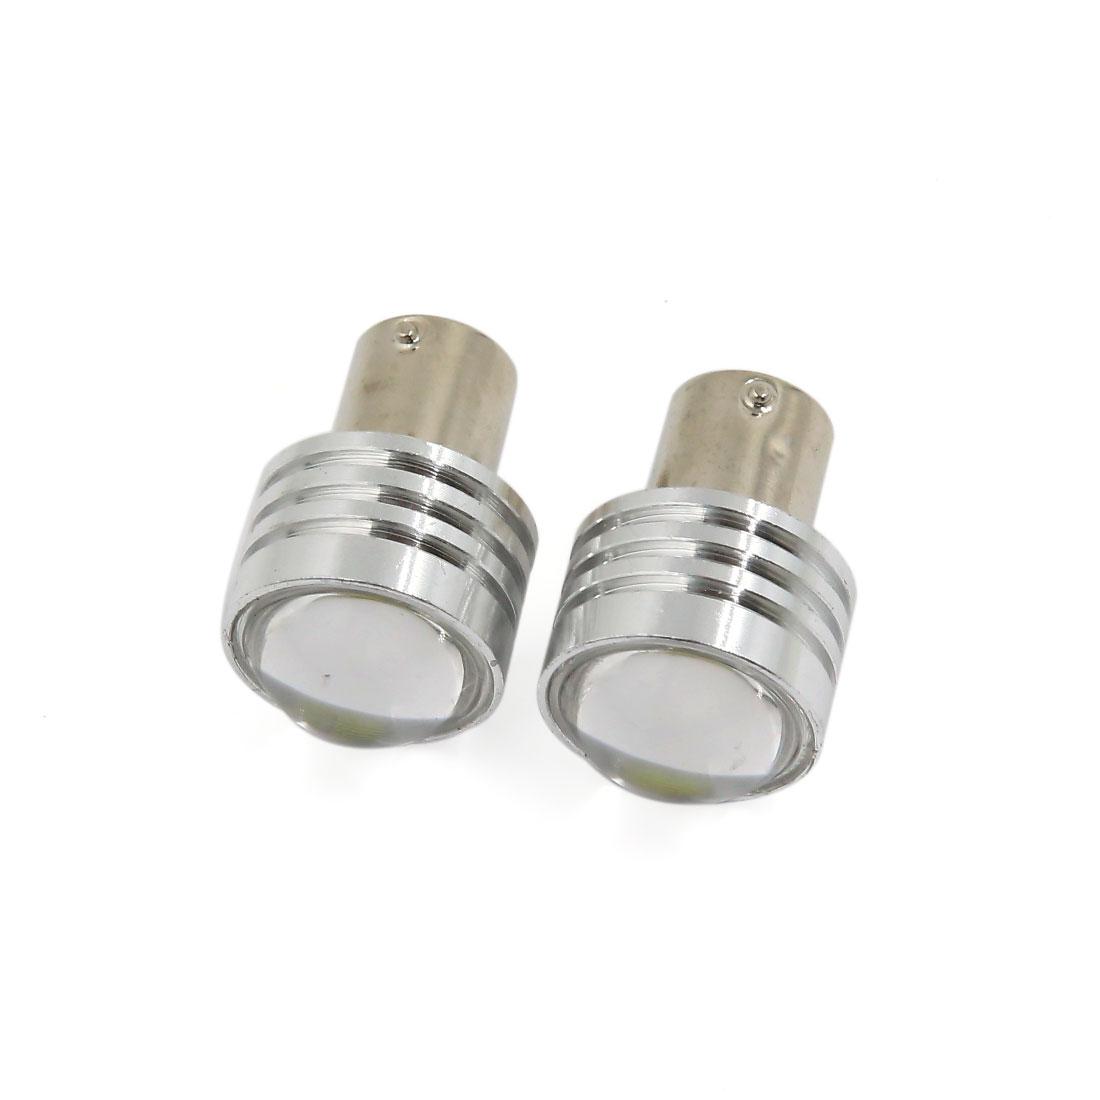 1156 BA15S 1141 White COB LED Turn Signal Light Bulbs for RV Camper Trailer Car